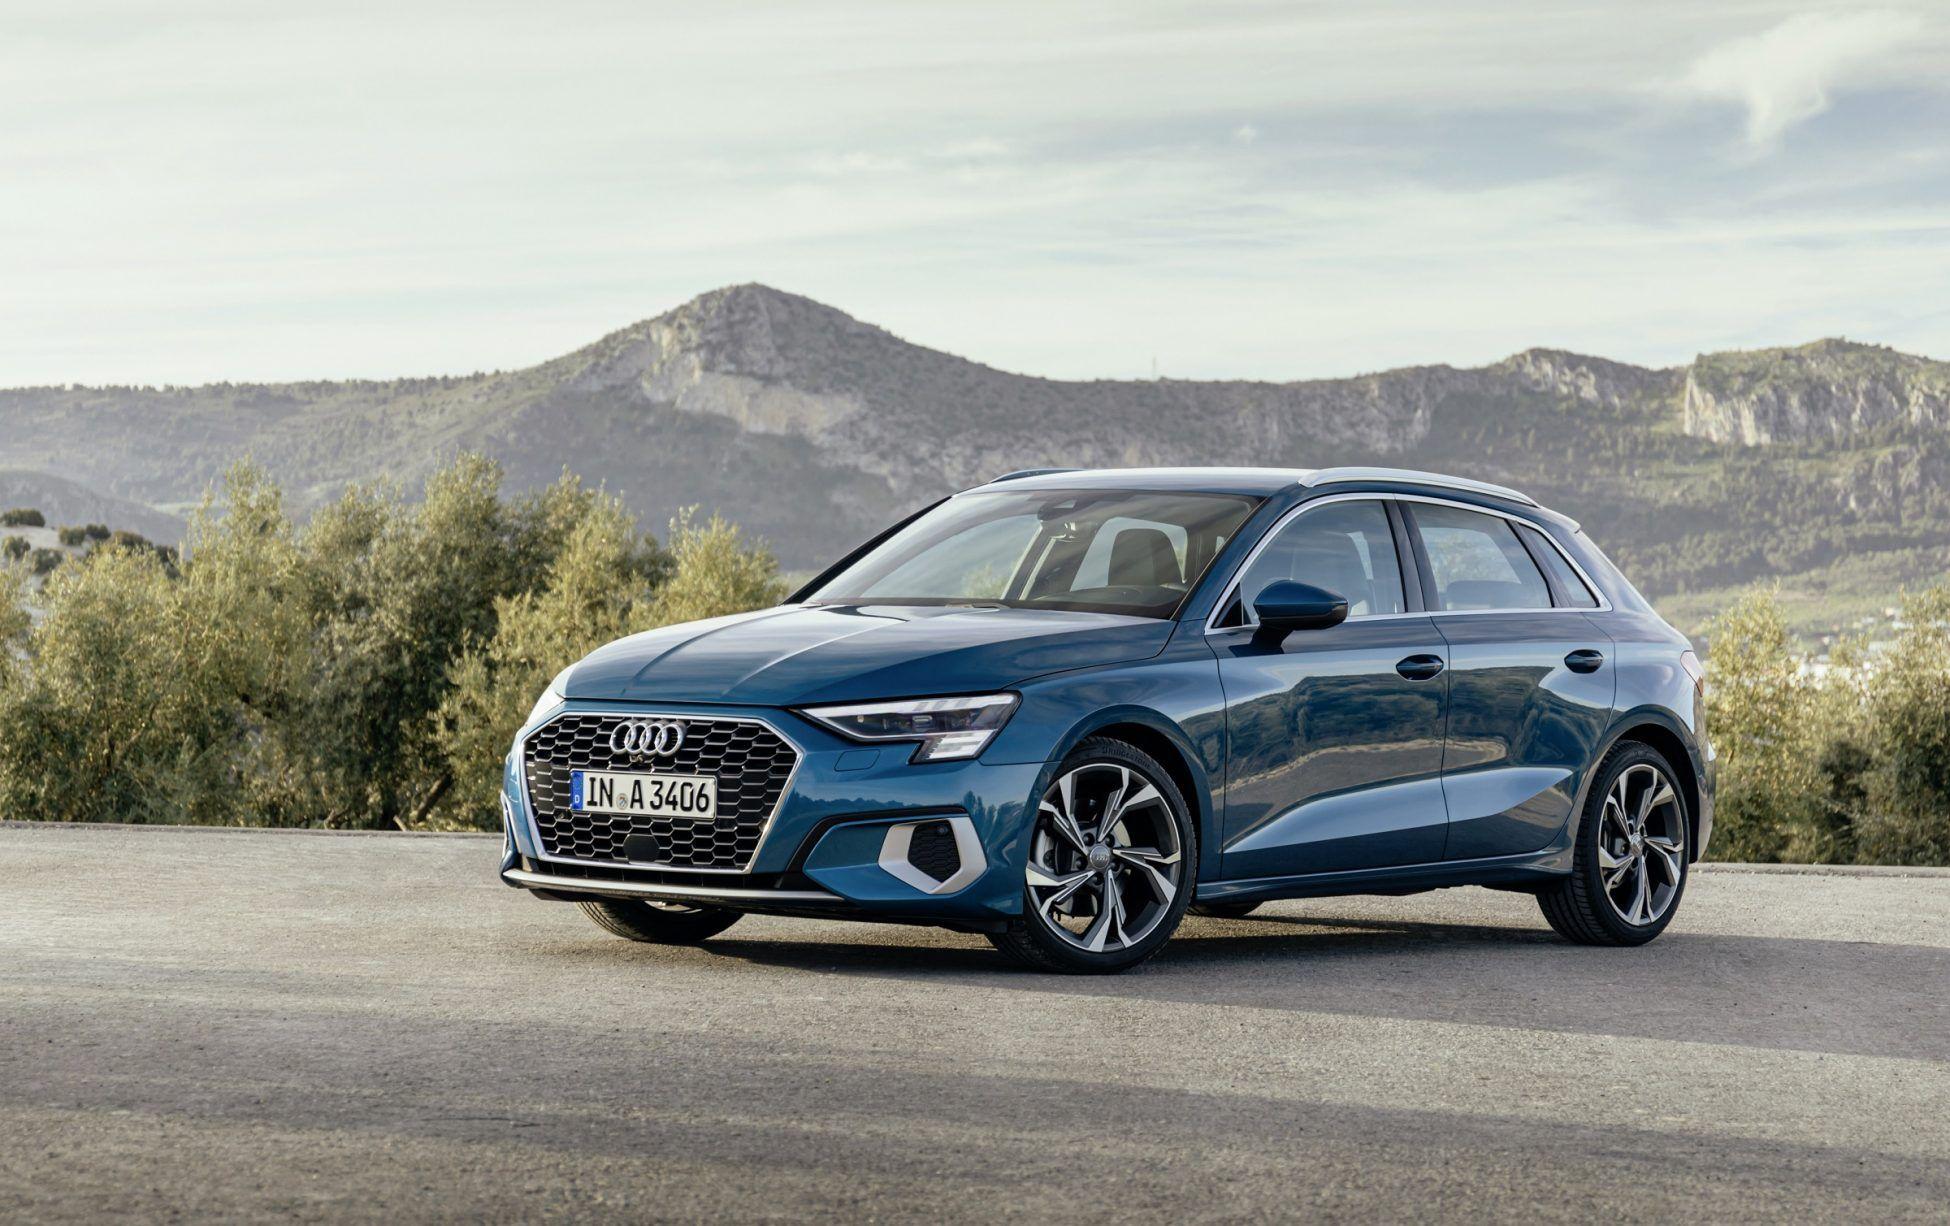 Audi A3 Sportback Ευφυές, εξηλεκτρισμένο και πλήρως